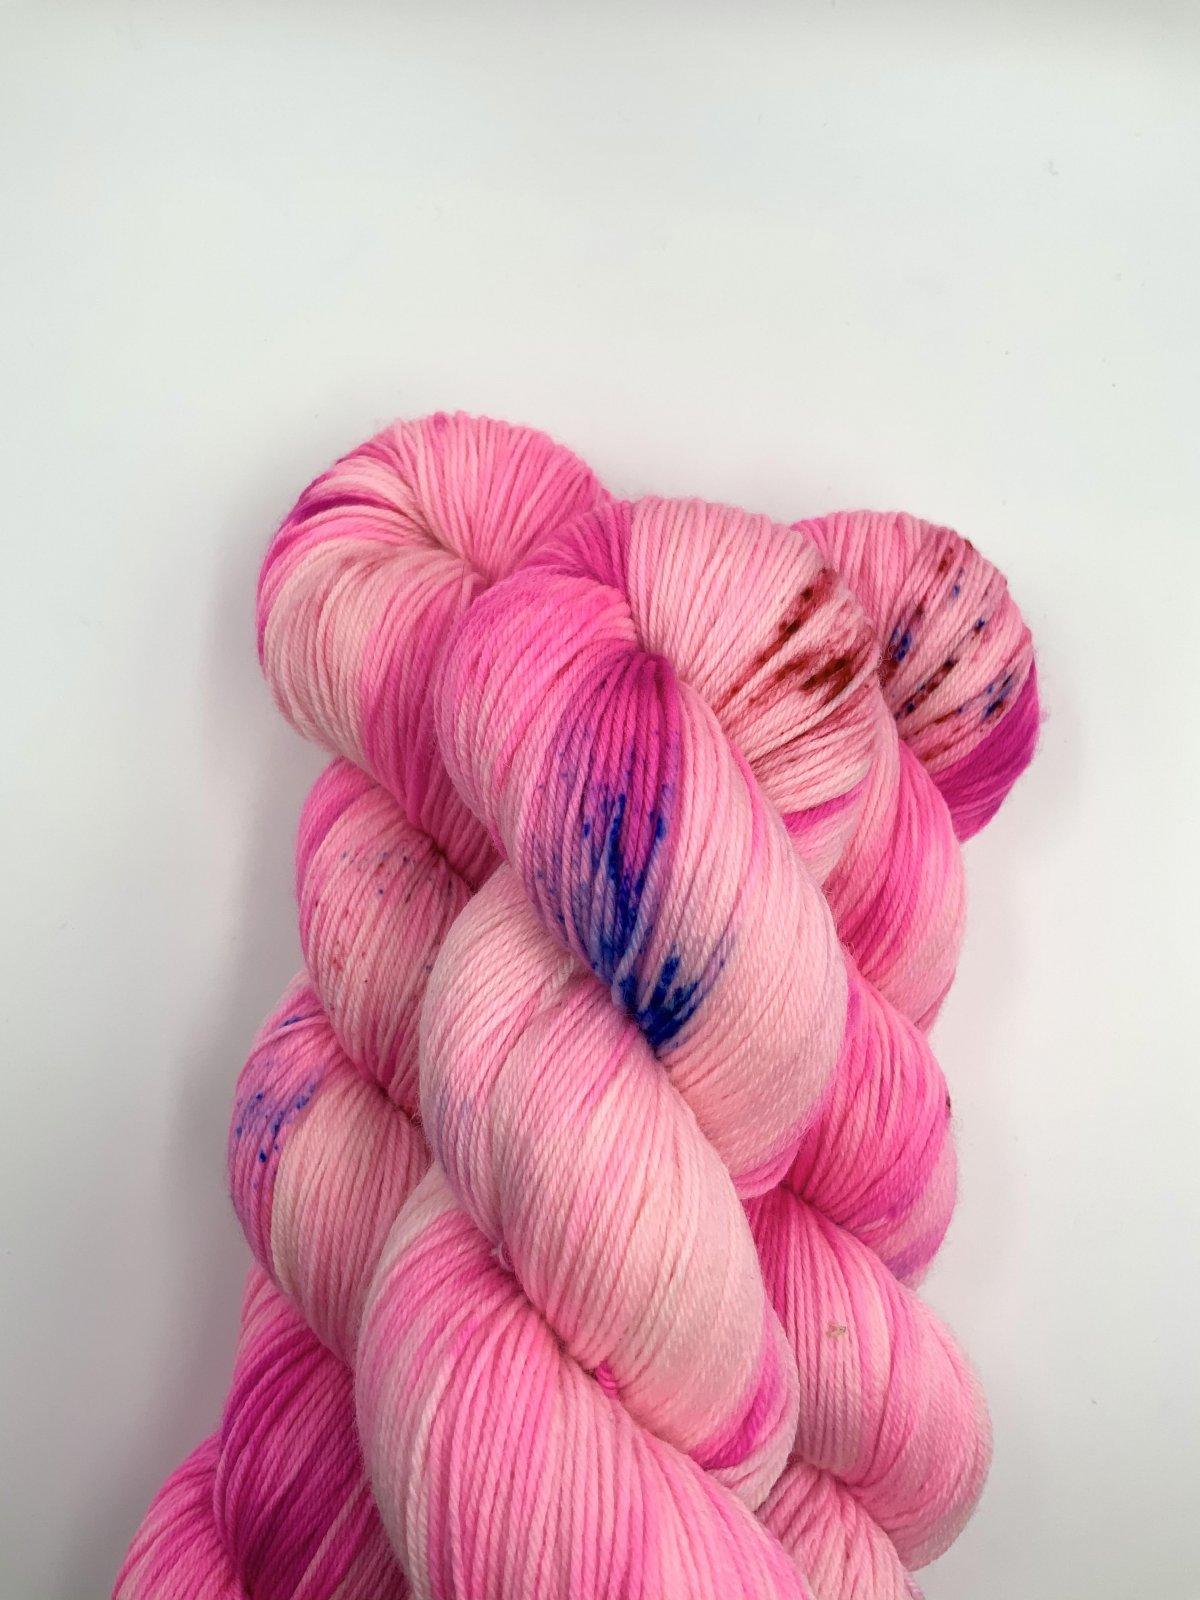 Kleur en Draad Merino 4ply Fingering - Bubblegum